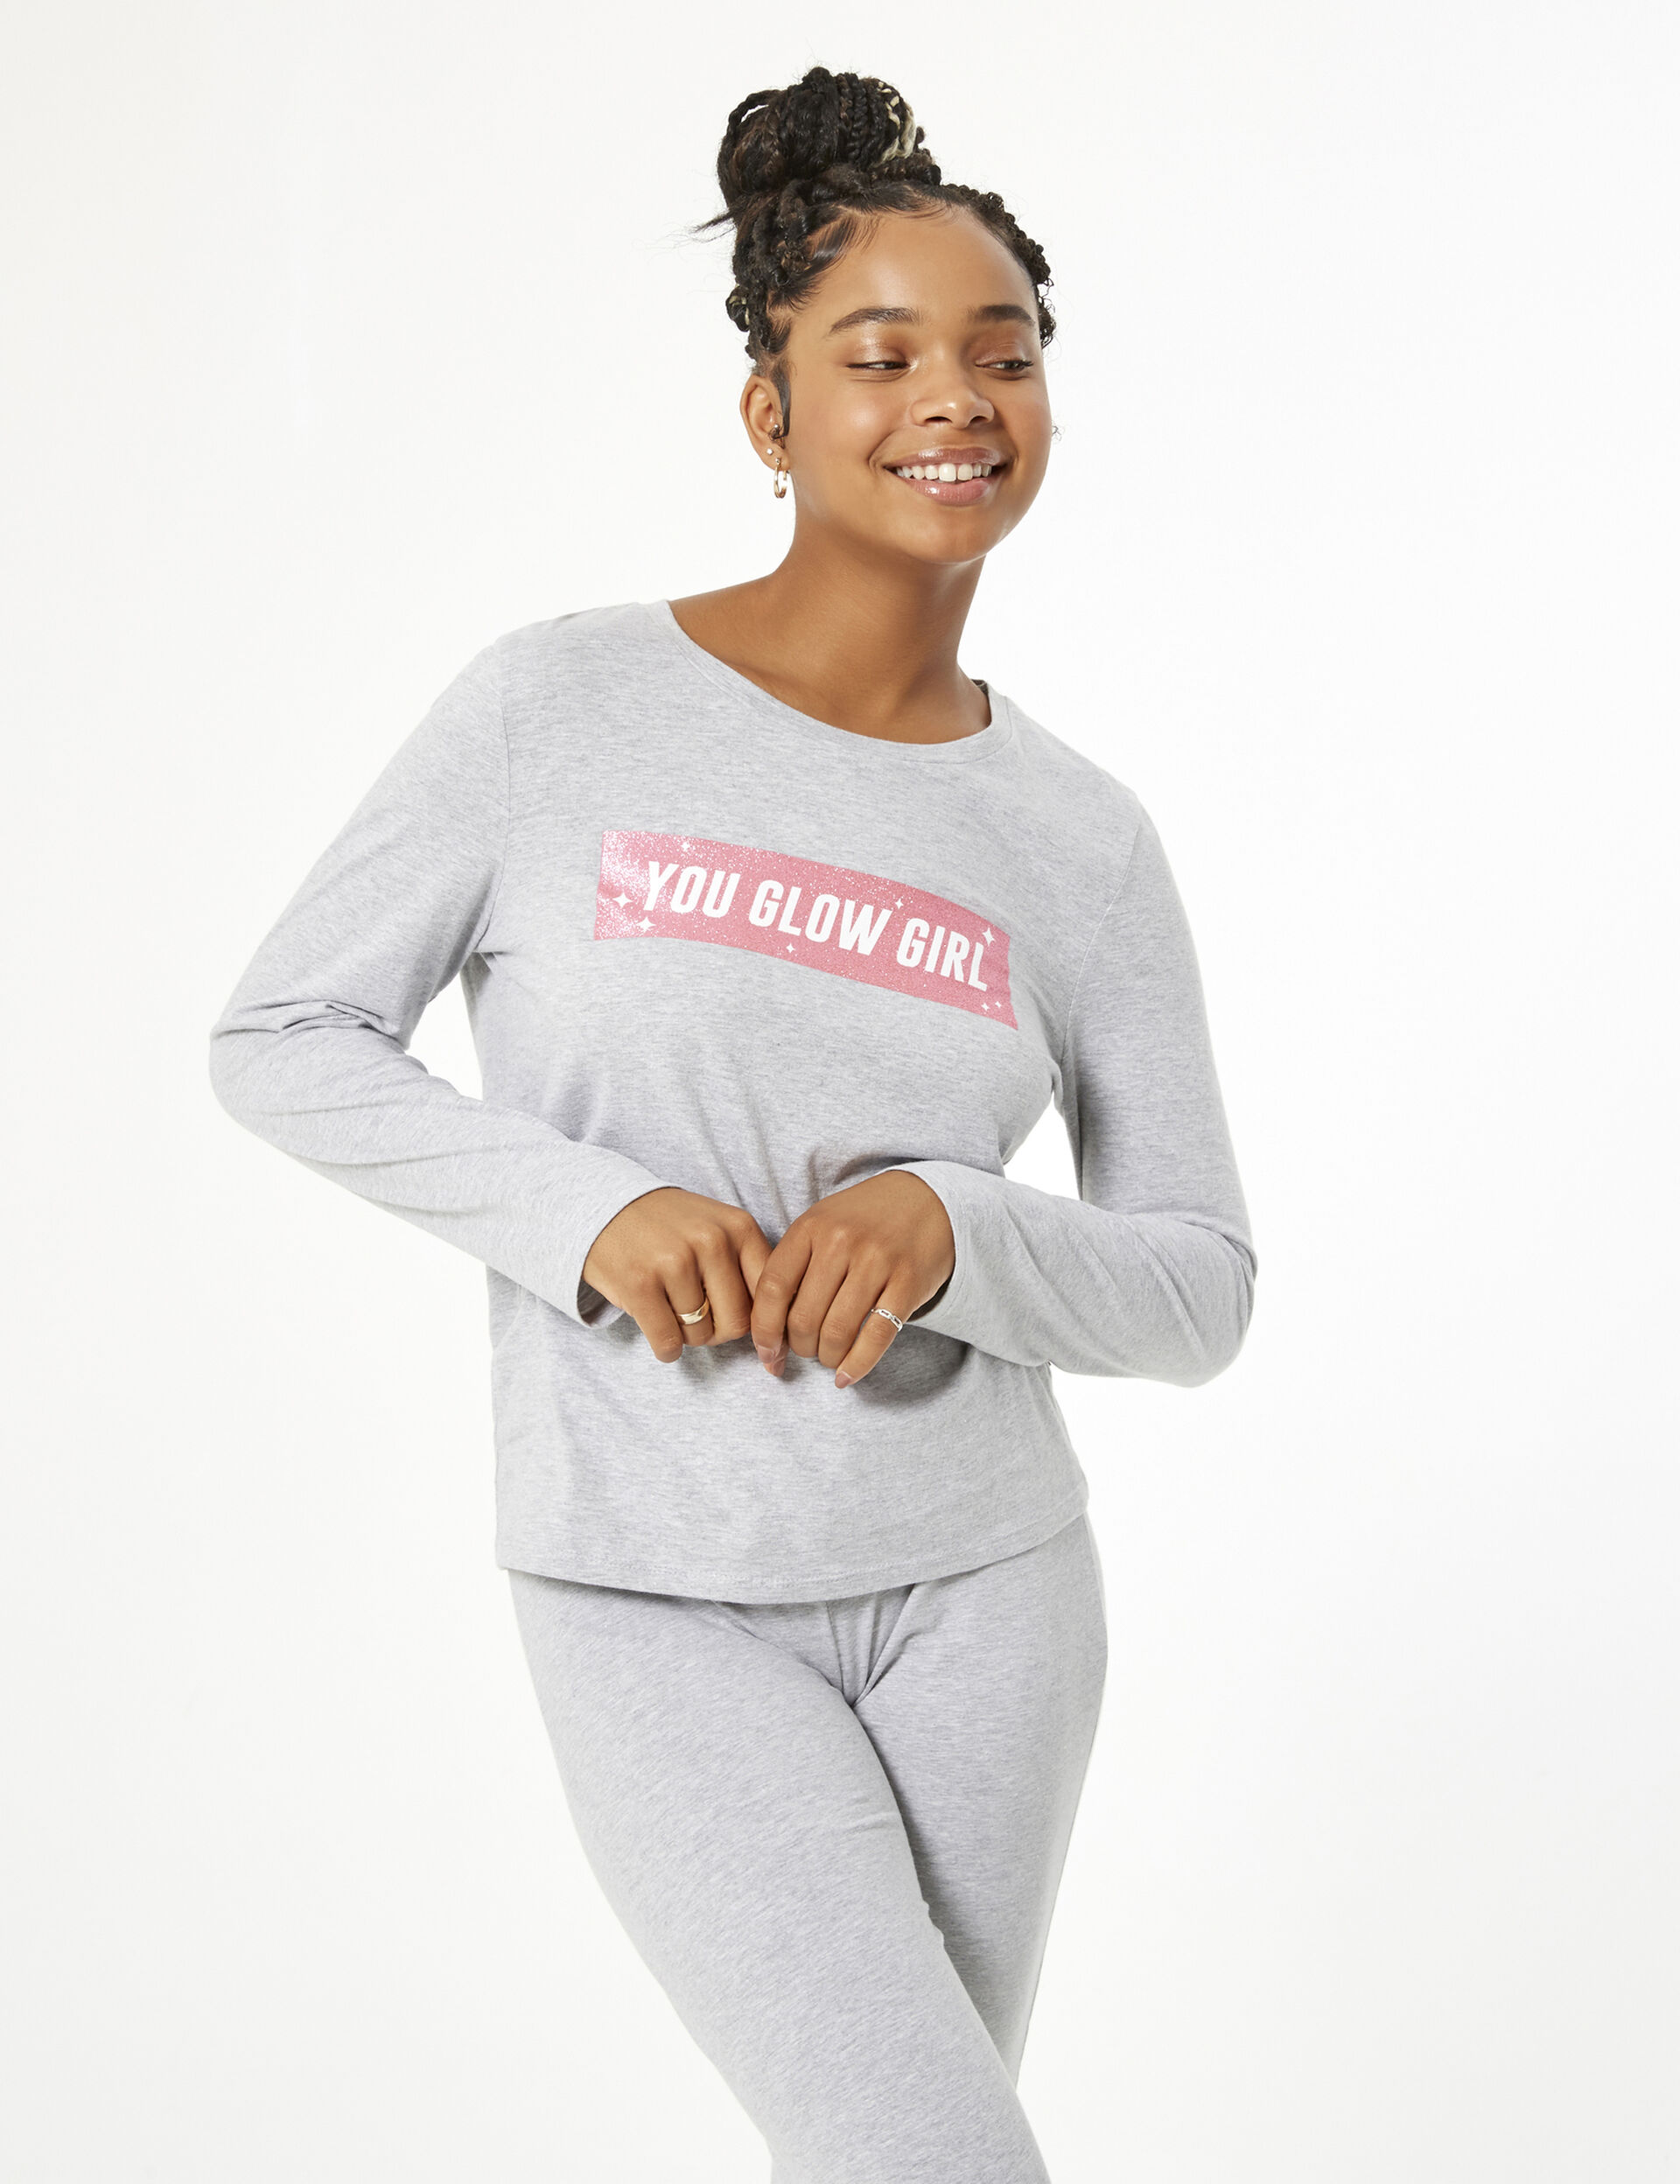 You glow girl pyjama set